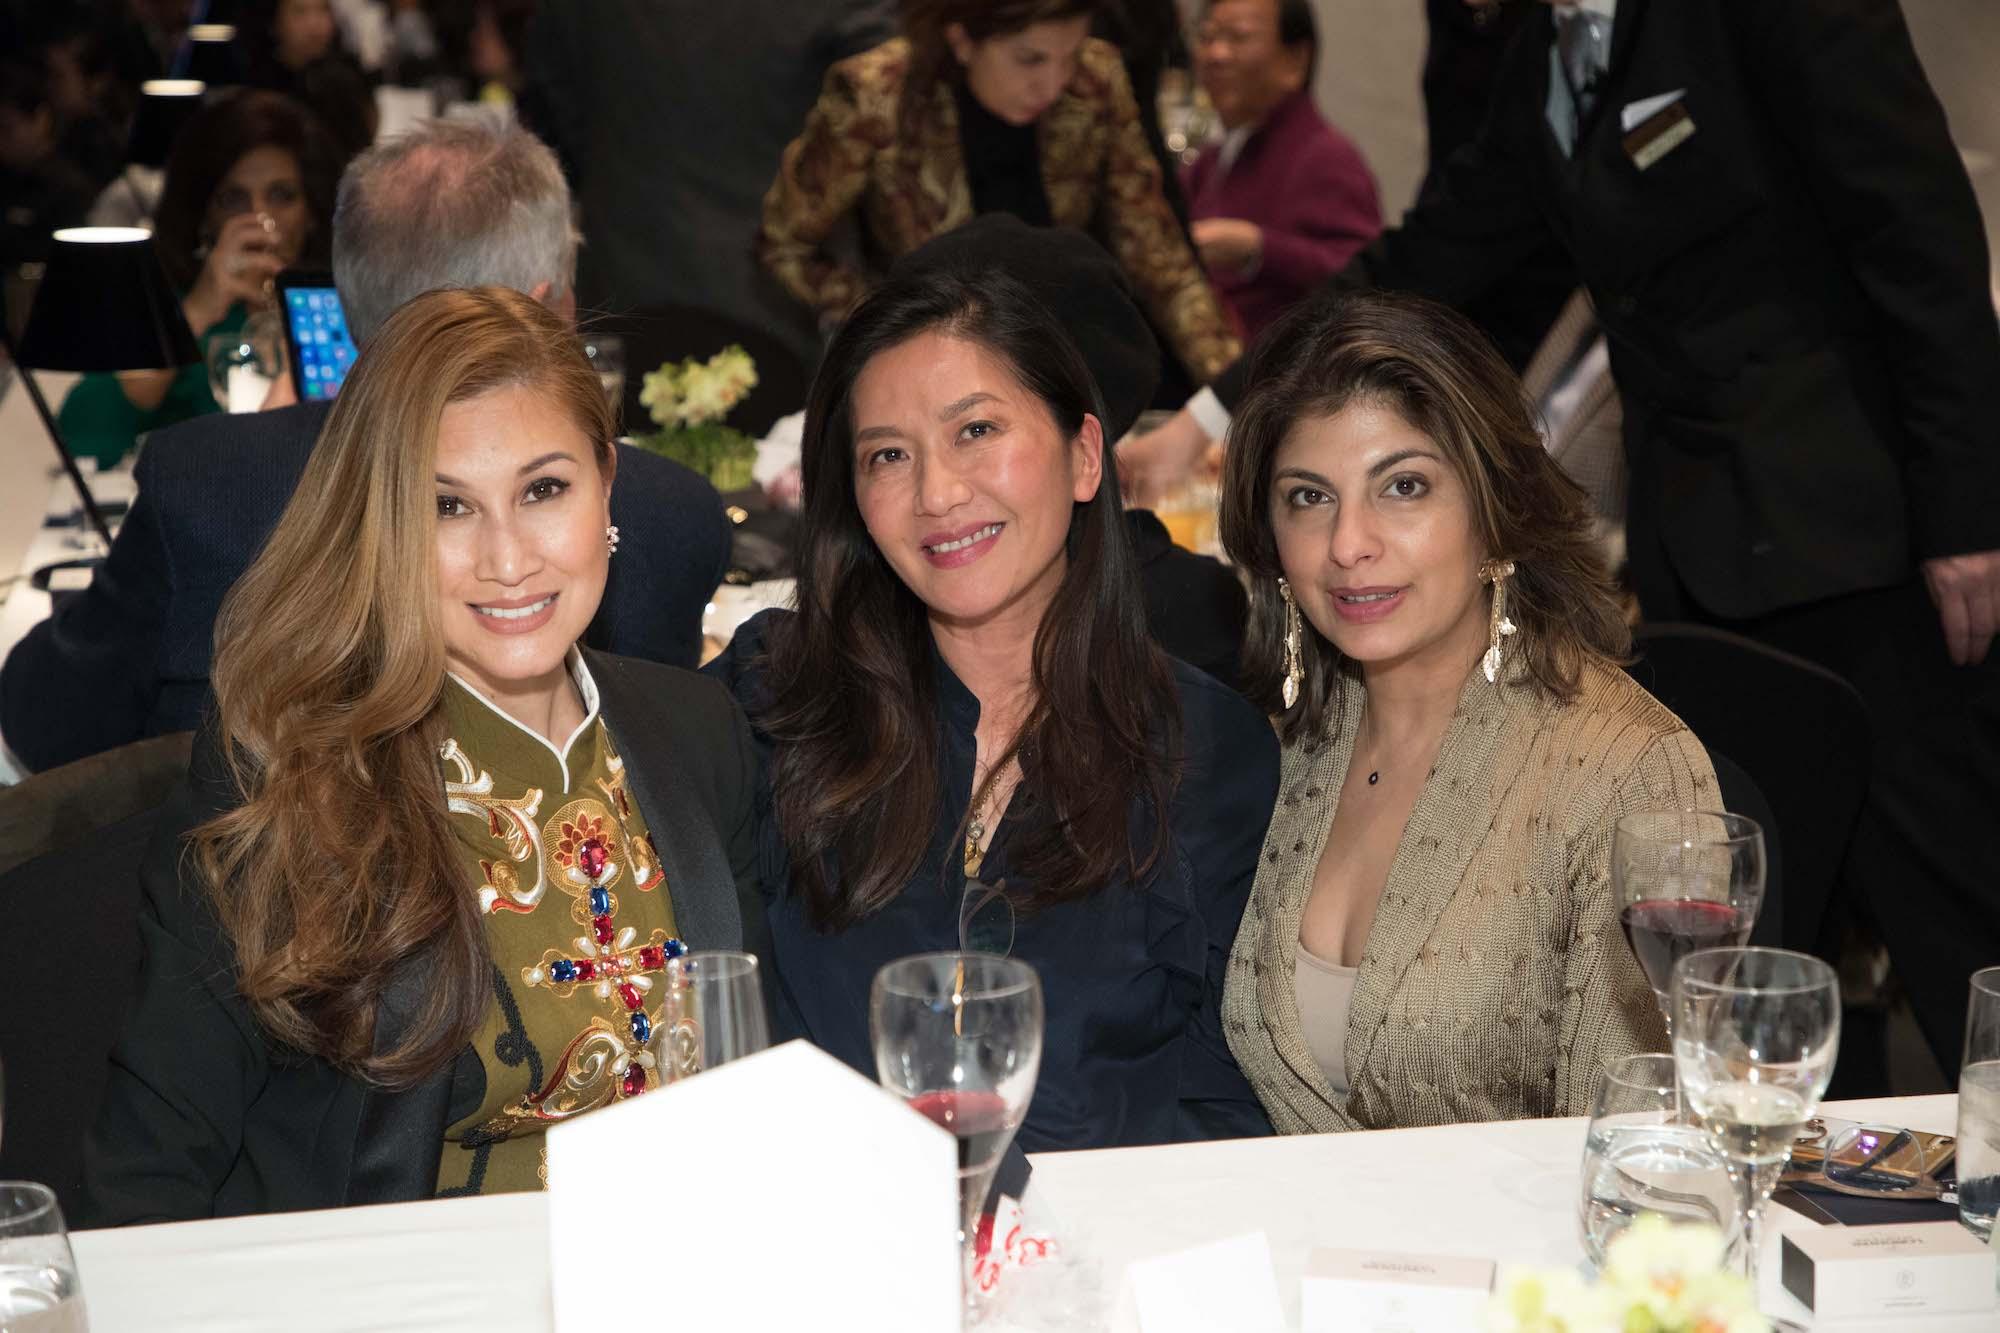 Anna Treier, Judy Den Hartog Hsu, Reyna Harilela